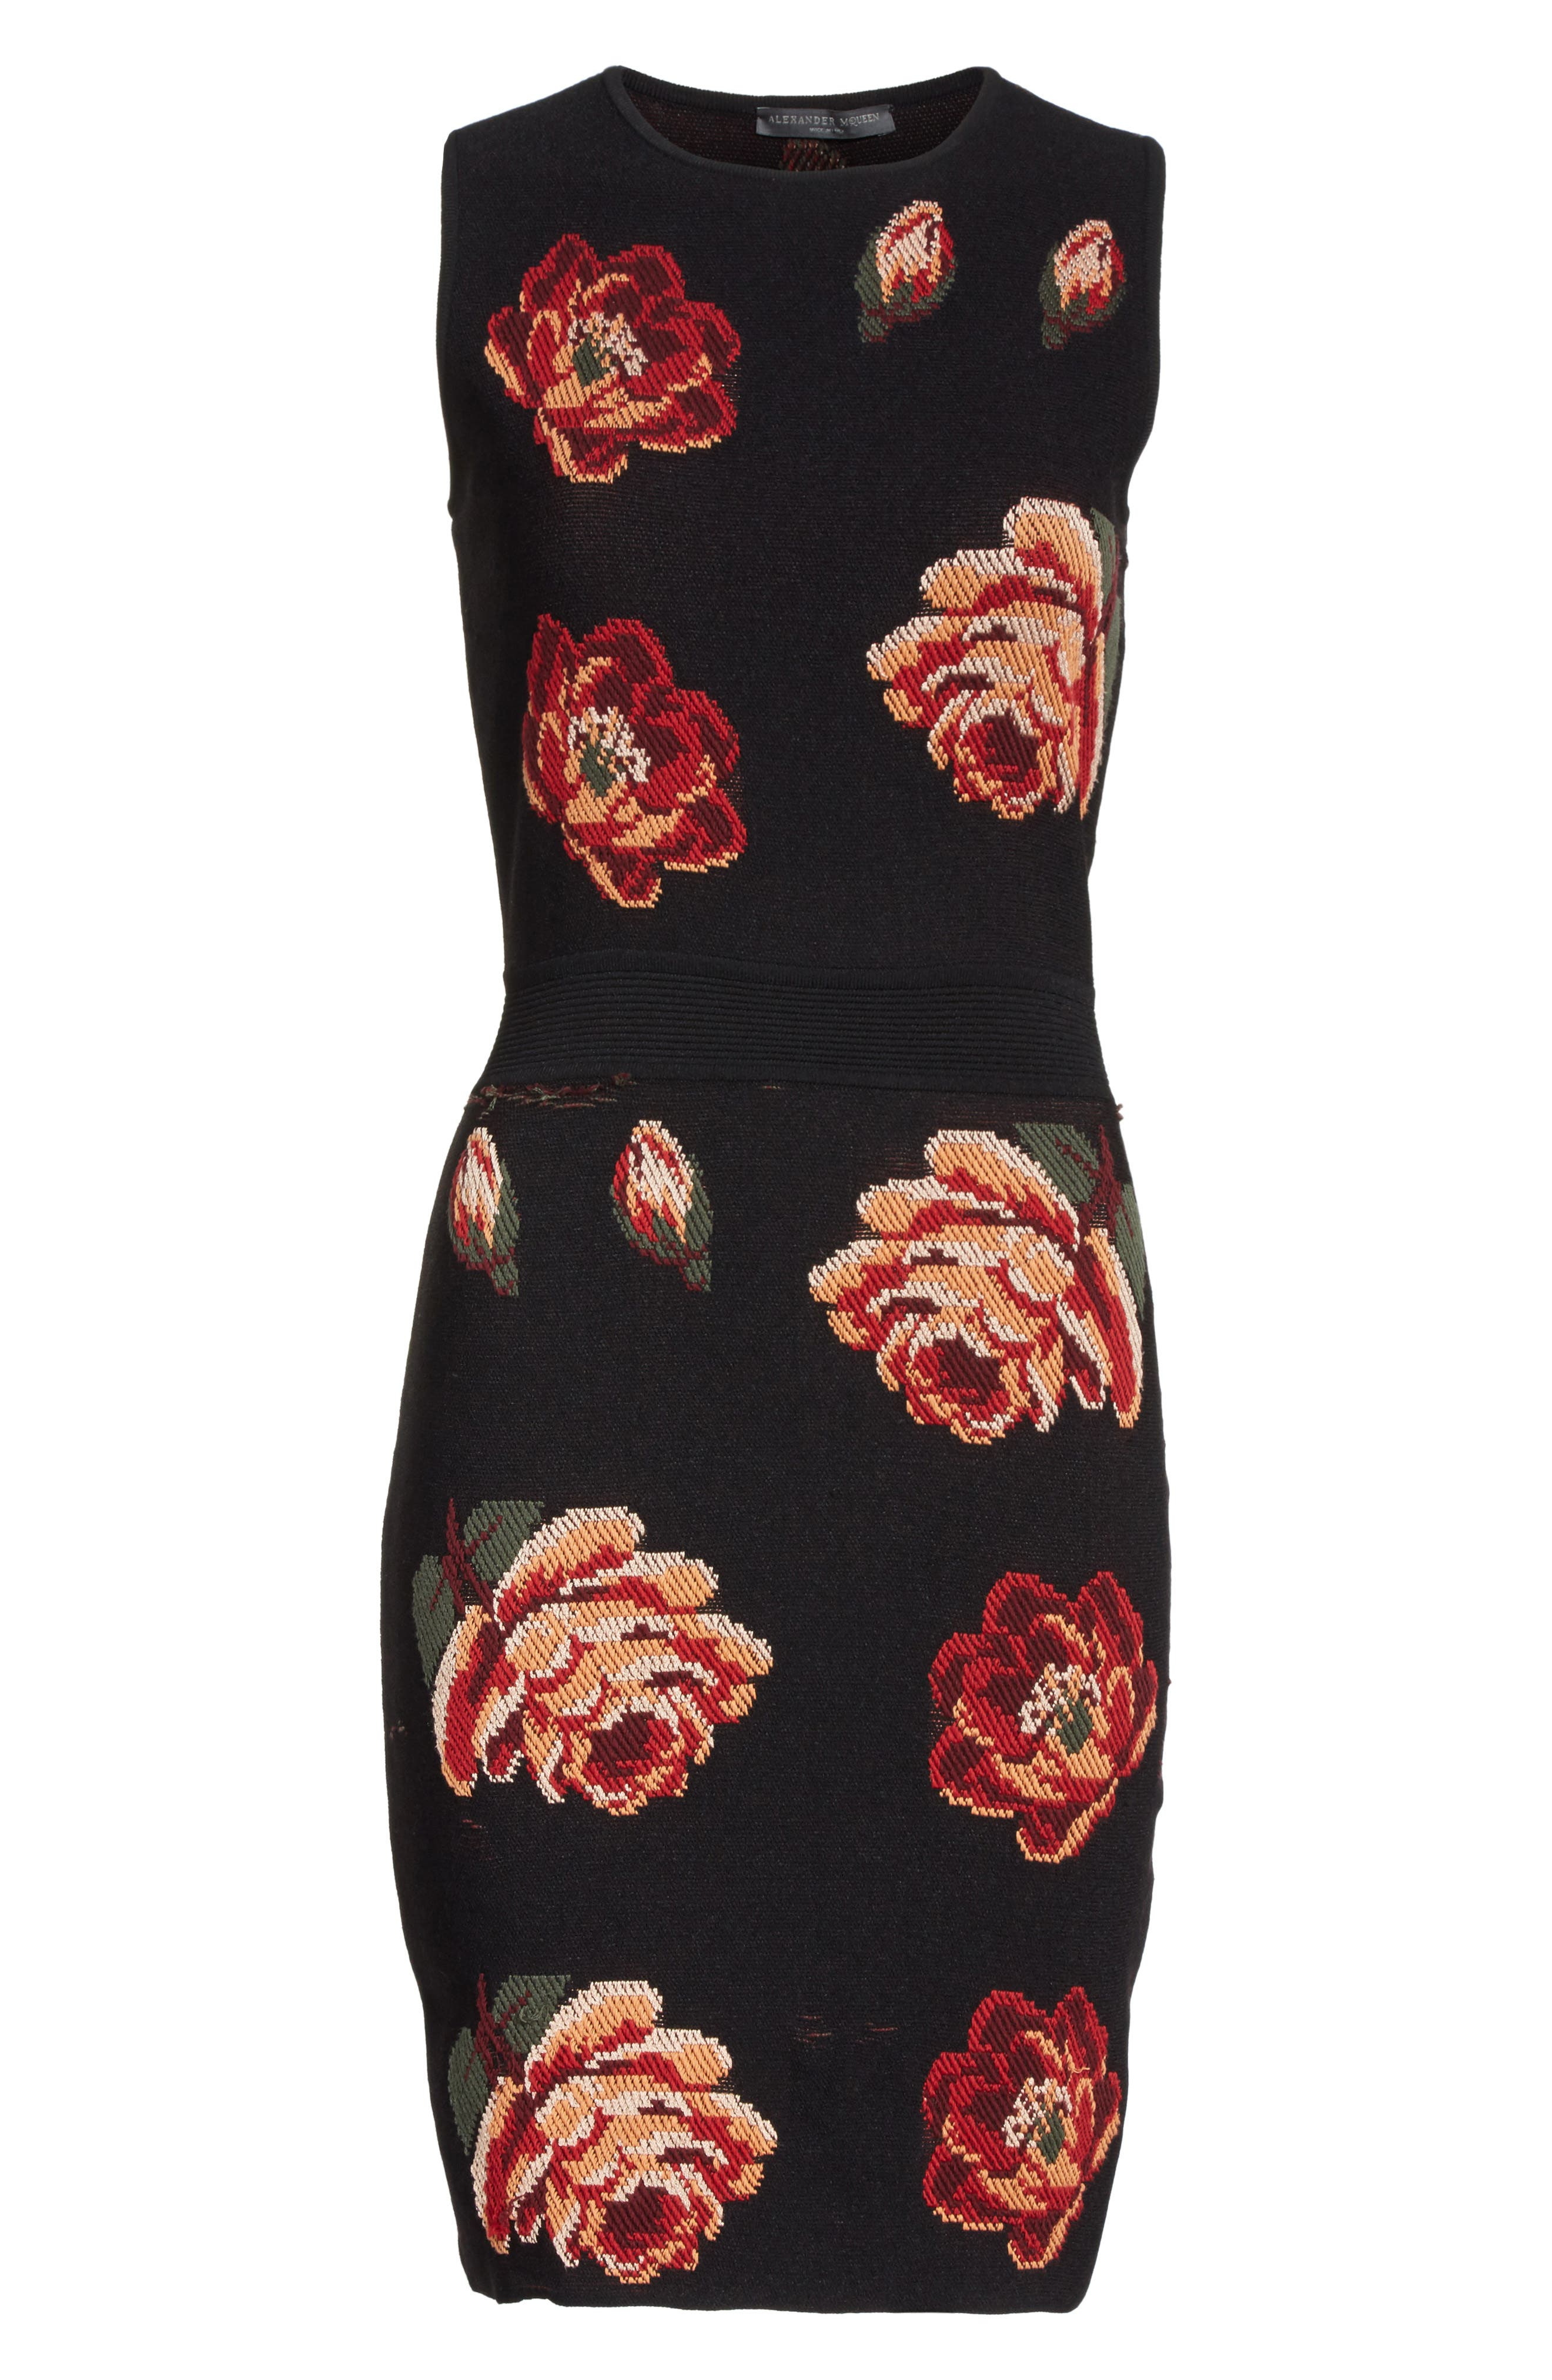 Intarsia Floral Print Dress,                             Alternate thumbnail 6, color,                             Black/ Red/ Green